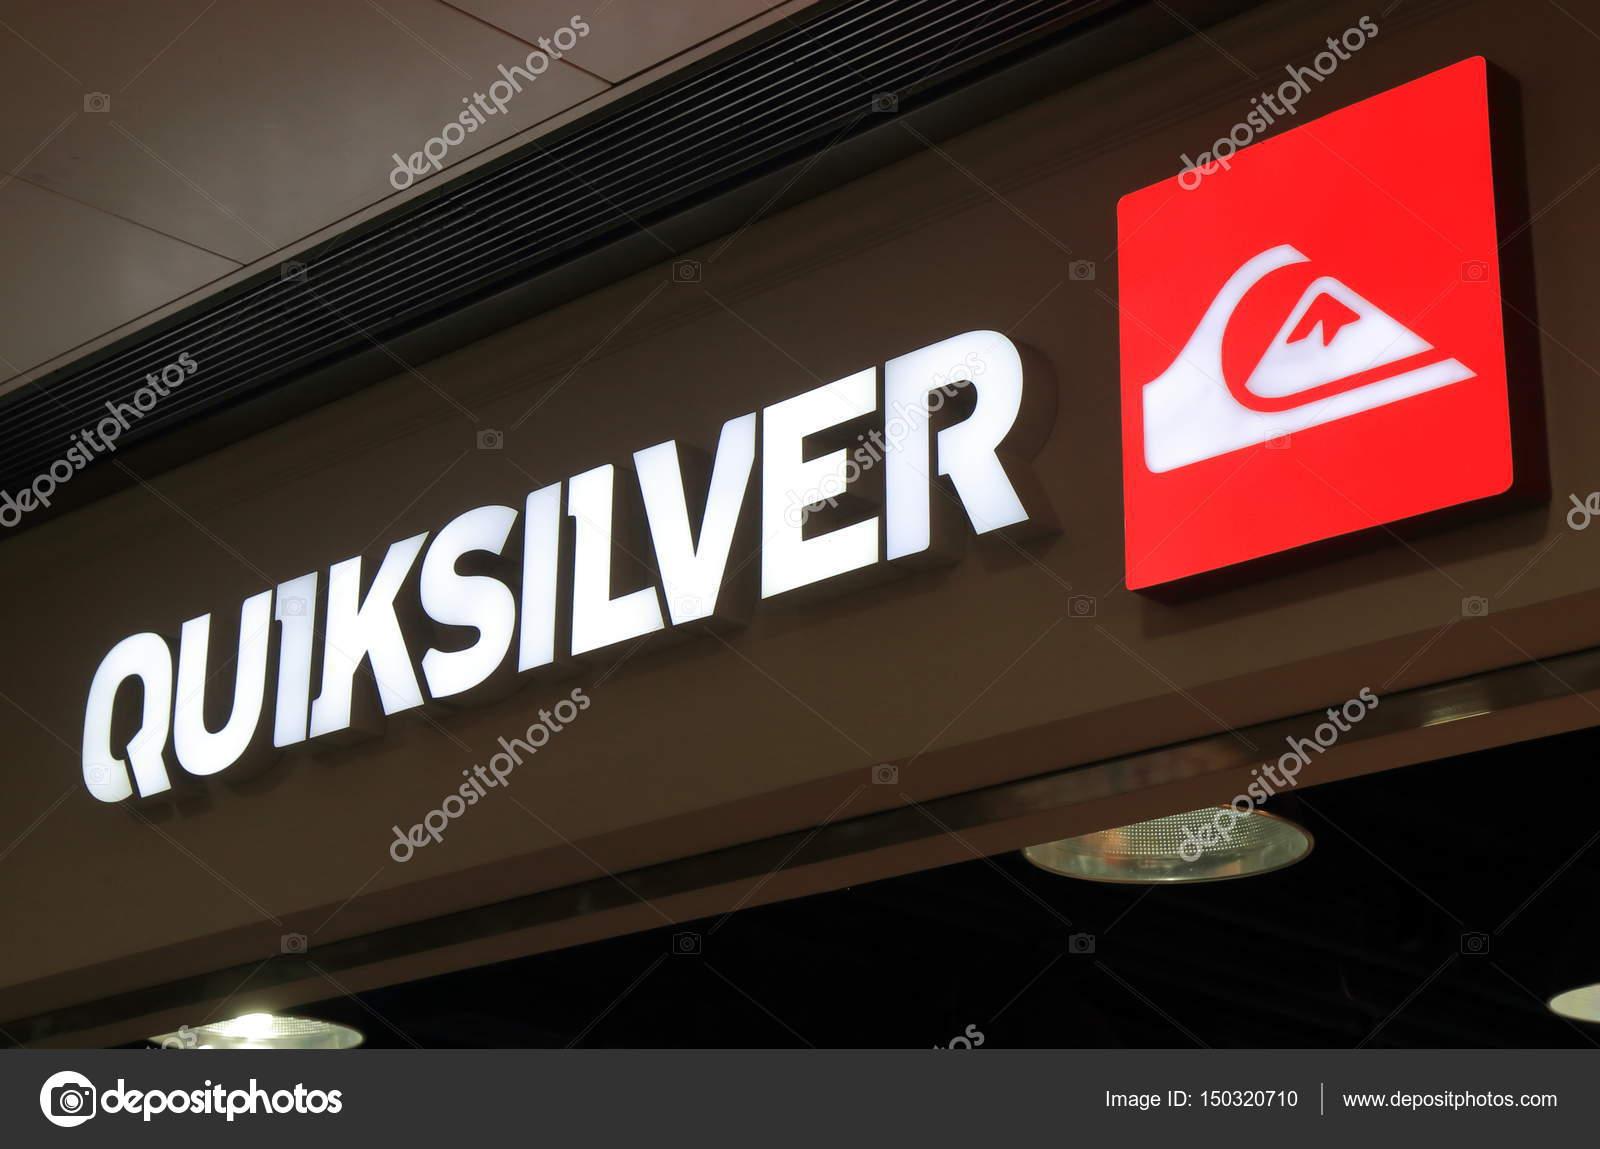 Marca de moda Quicksilver — Fotografia de Stock Editorial ... 3e4af1209f